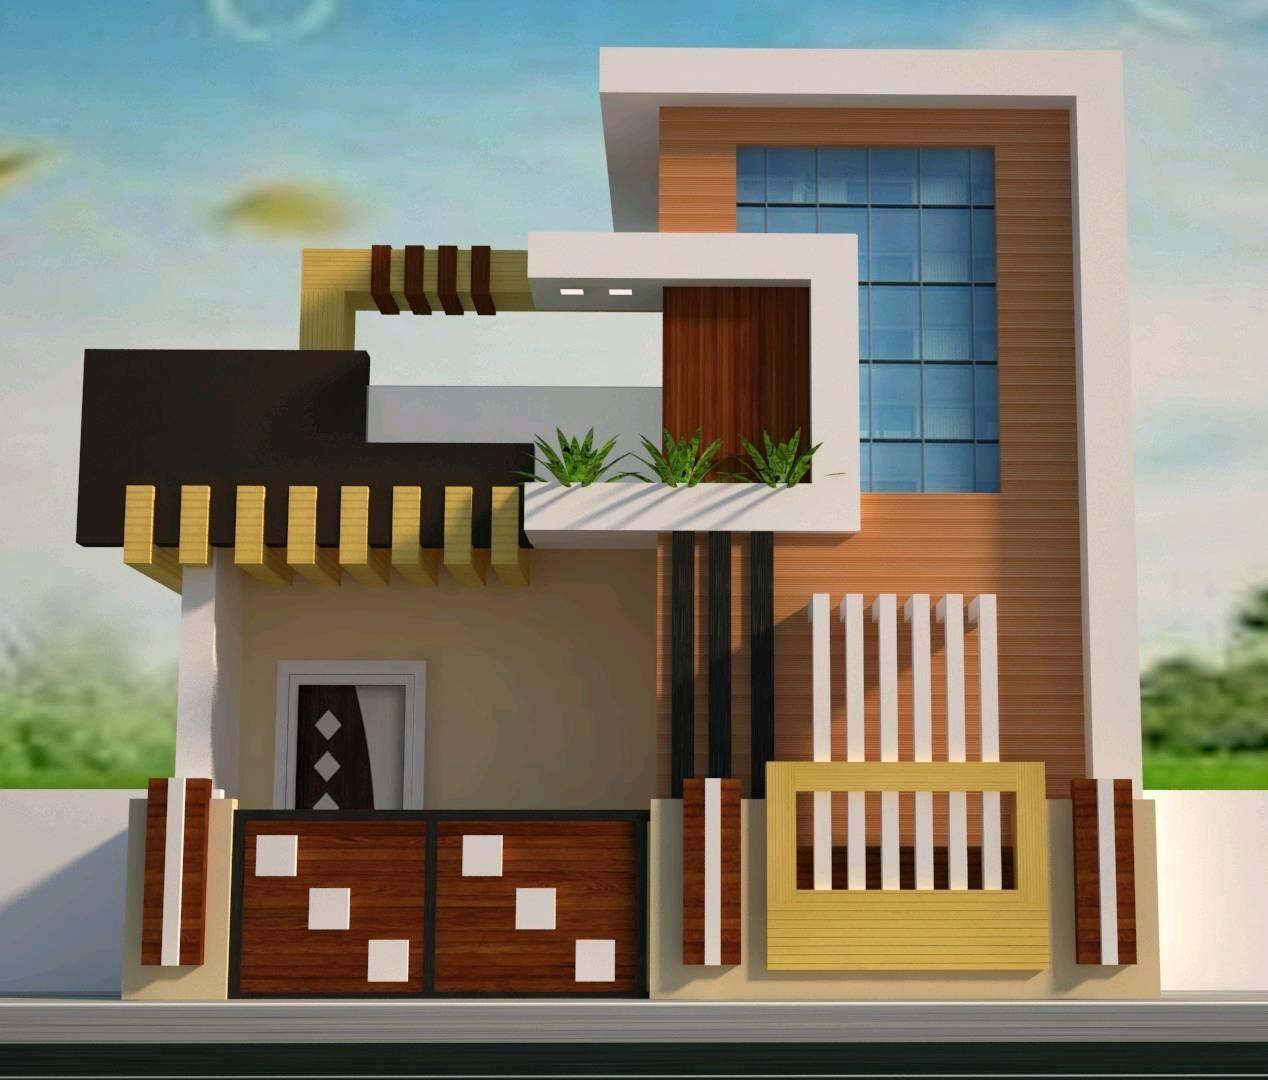 f5582ef7cc2dac31c8e667223a9adb91 - View Small House Design Elevation  Images